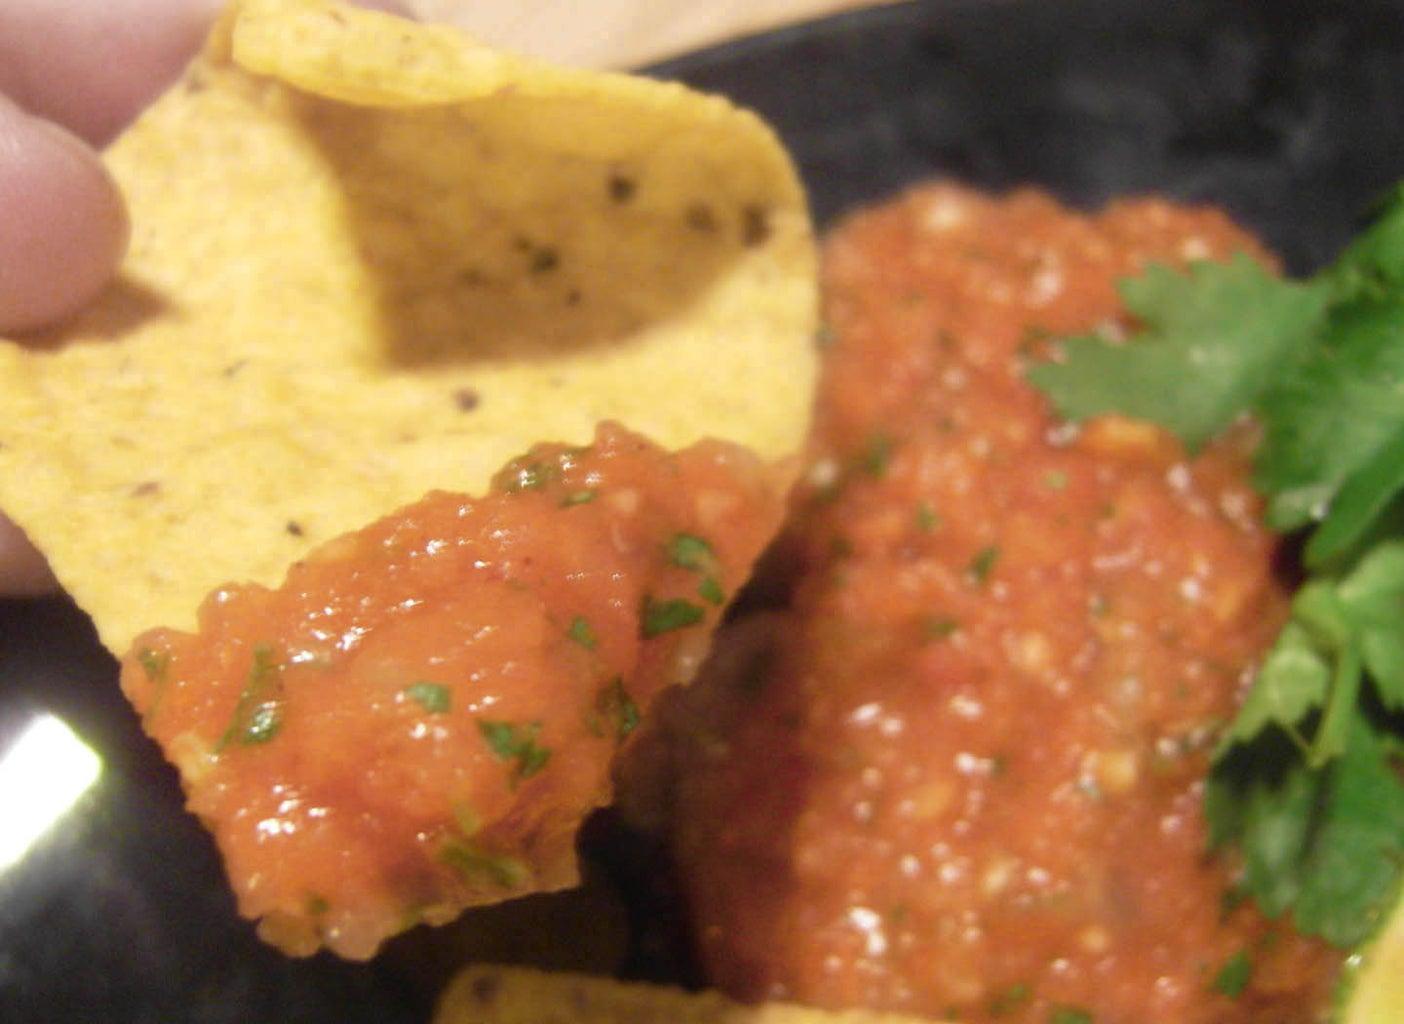 Salsa Roja Asada (Roasted Red Salsa)